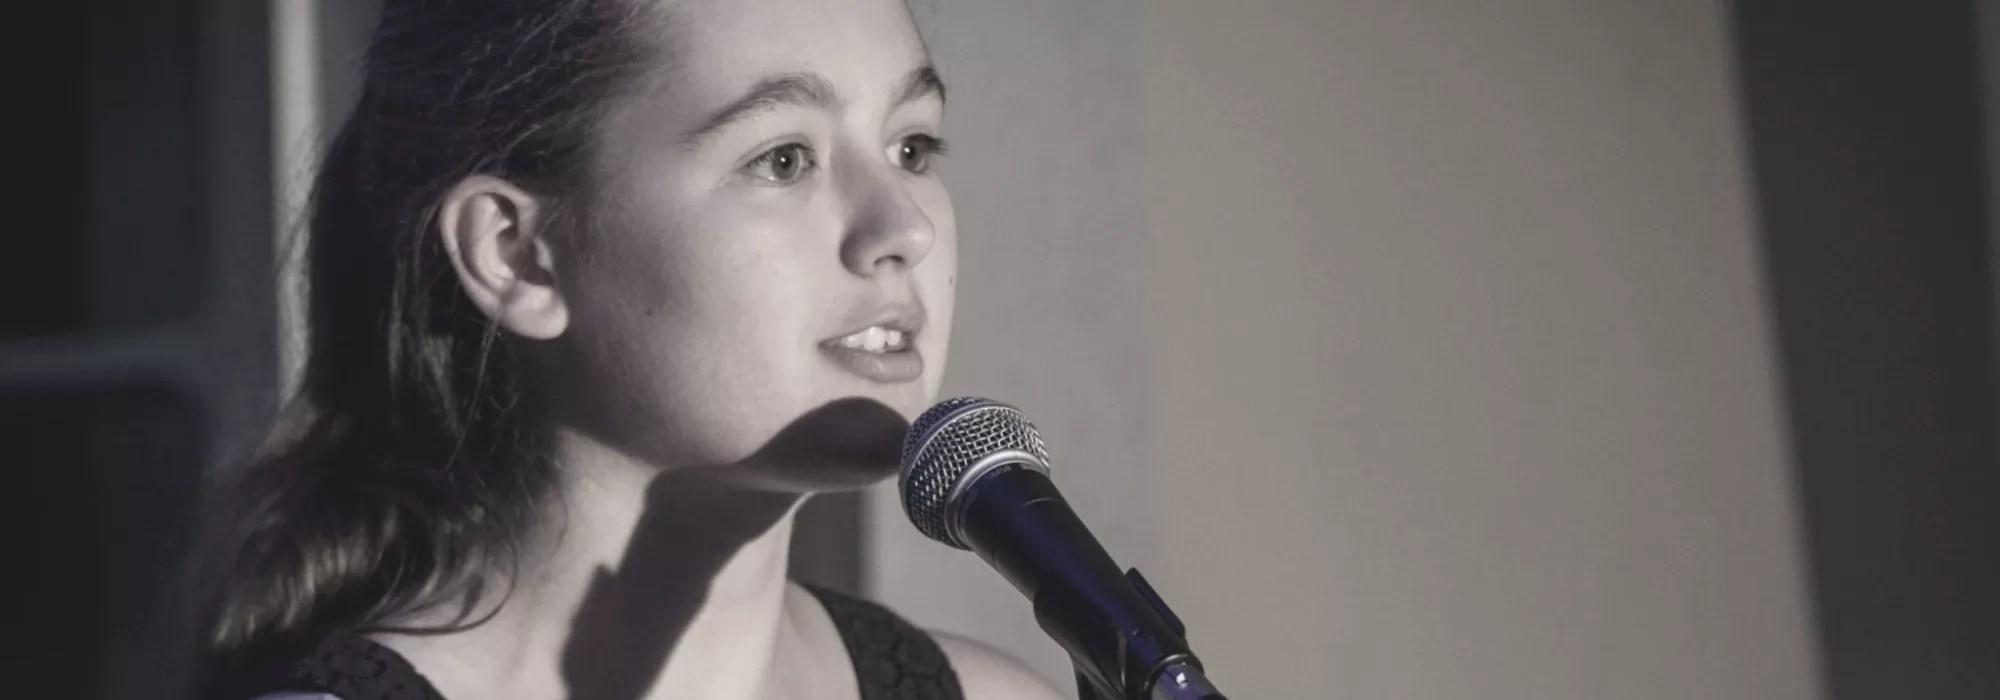 Poetry Slammerin steht am Mikrophon